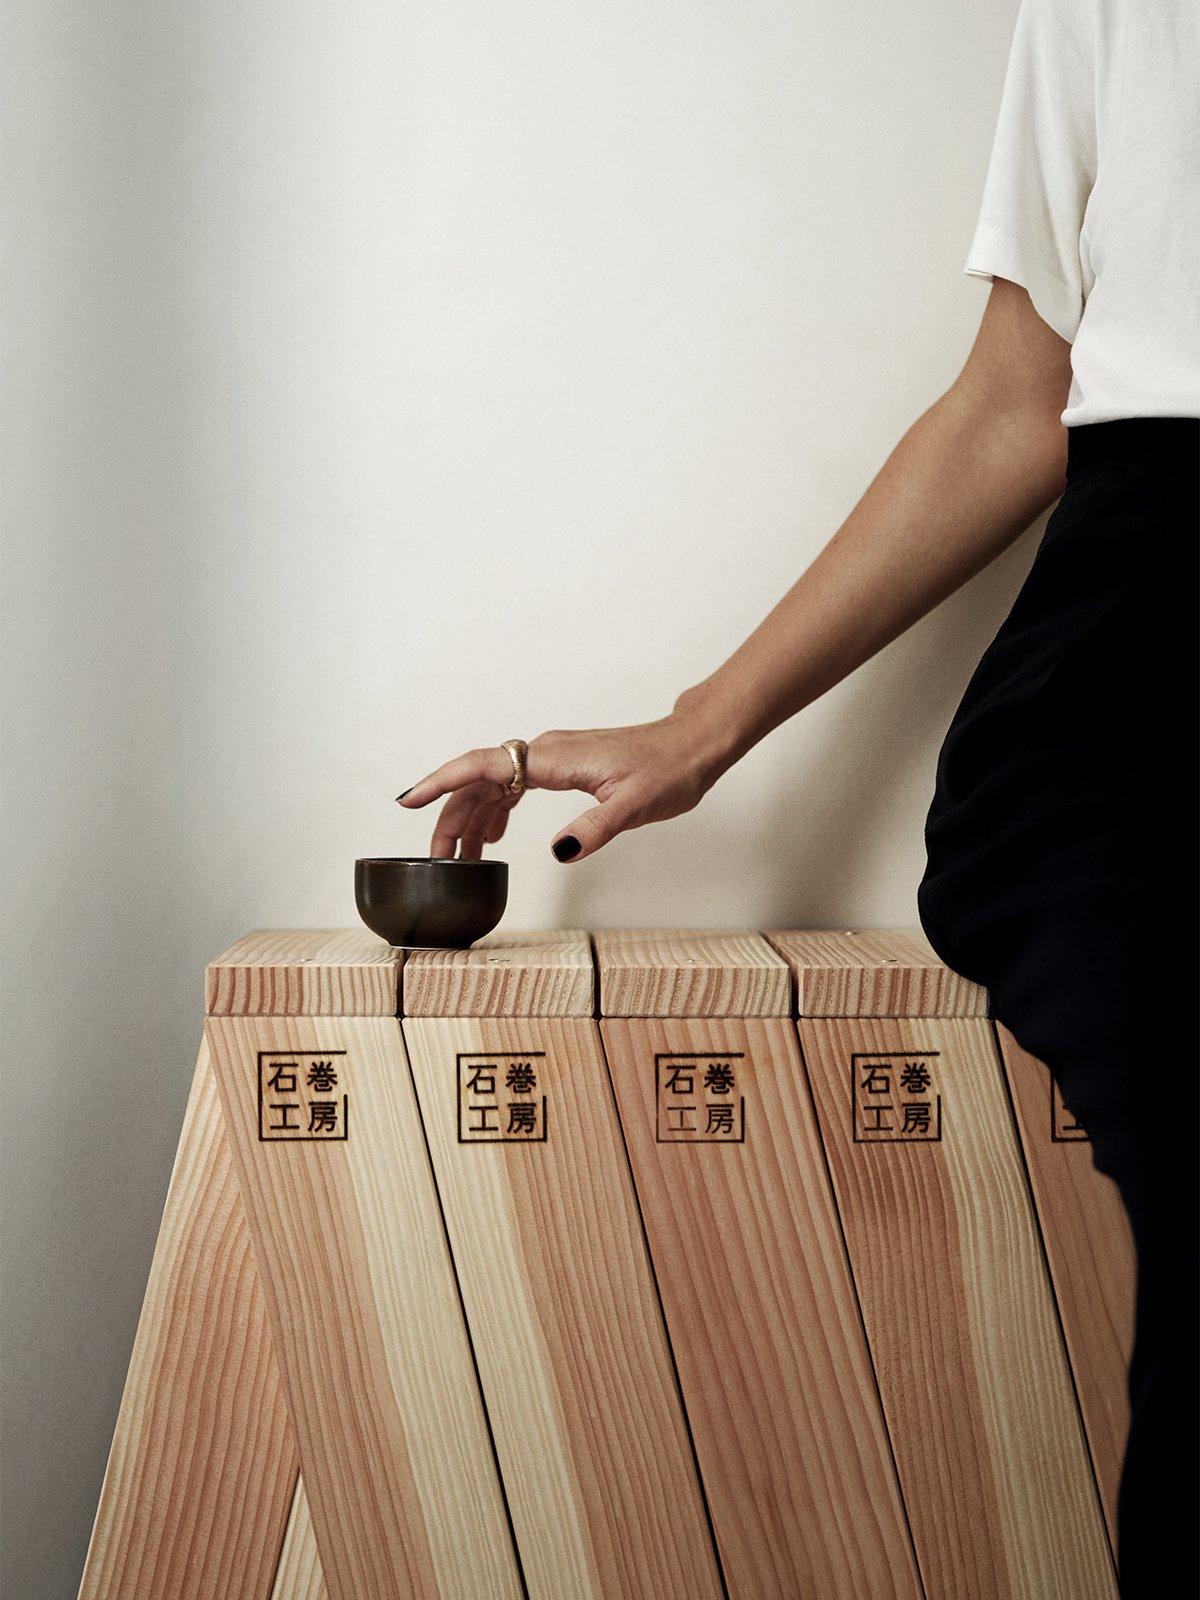 AA Stool by Ishinomaki Laboratory